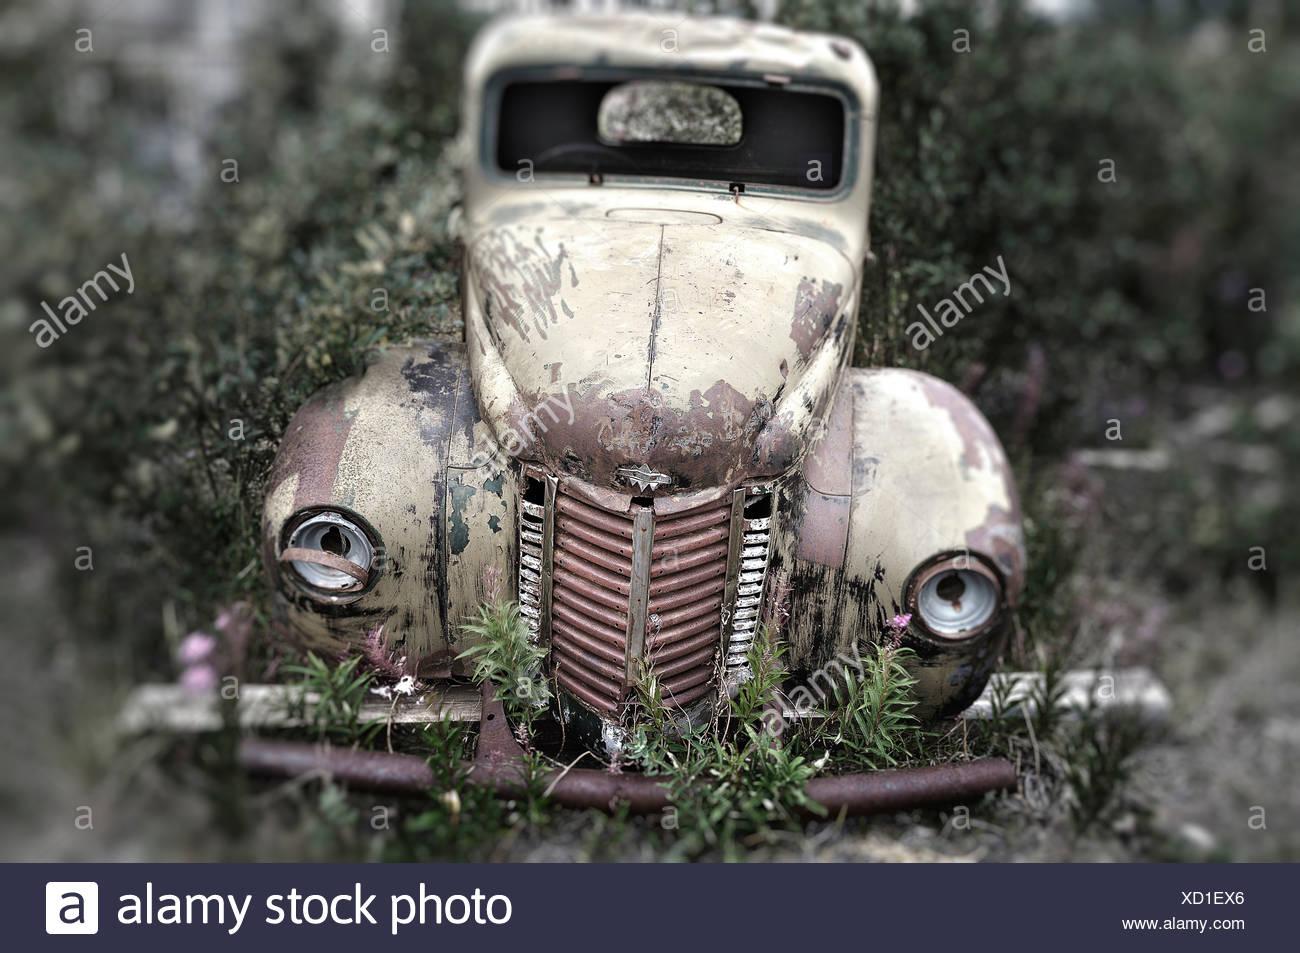 Old abandoned International truck in Destruction Bay, Yukon Territory, Canada - Stock Image